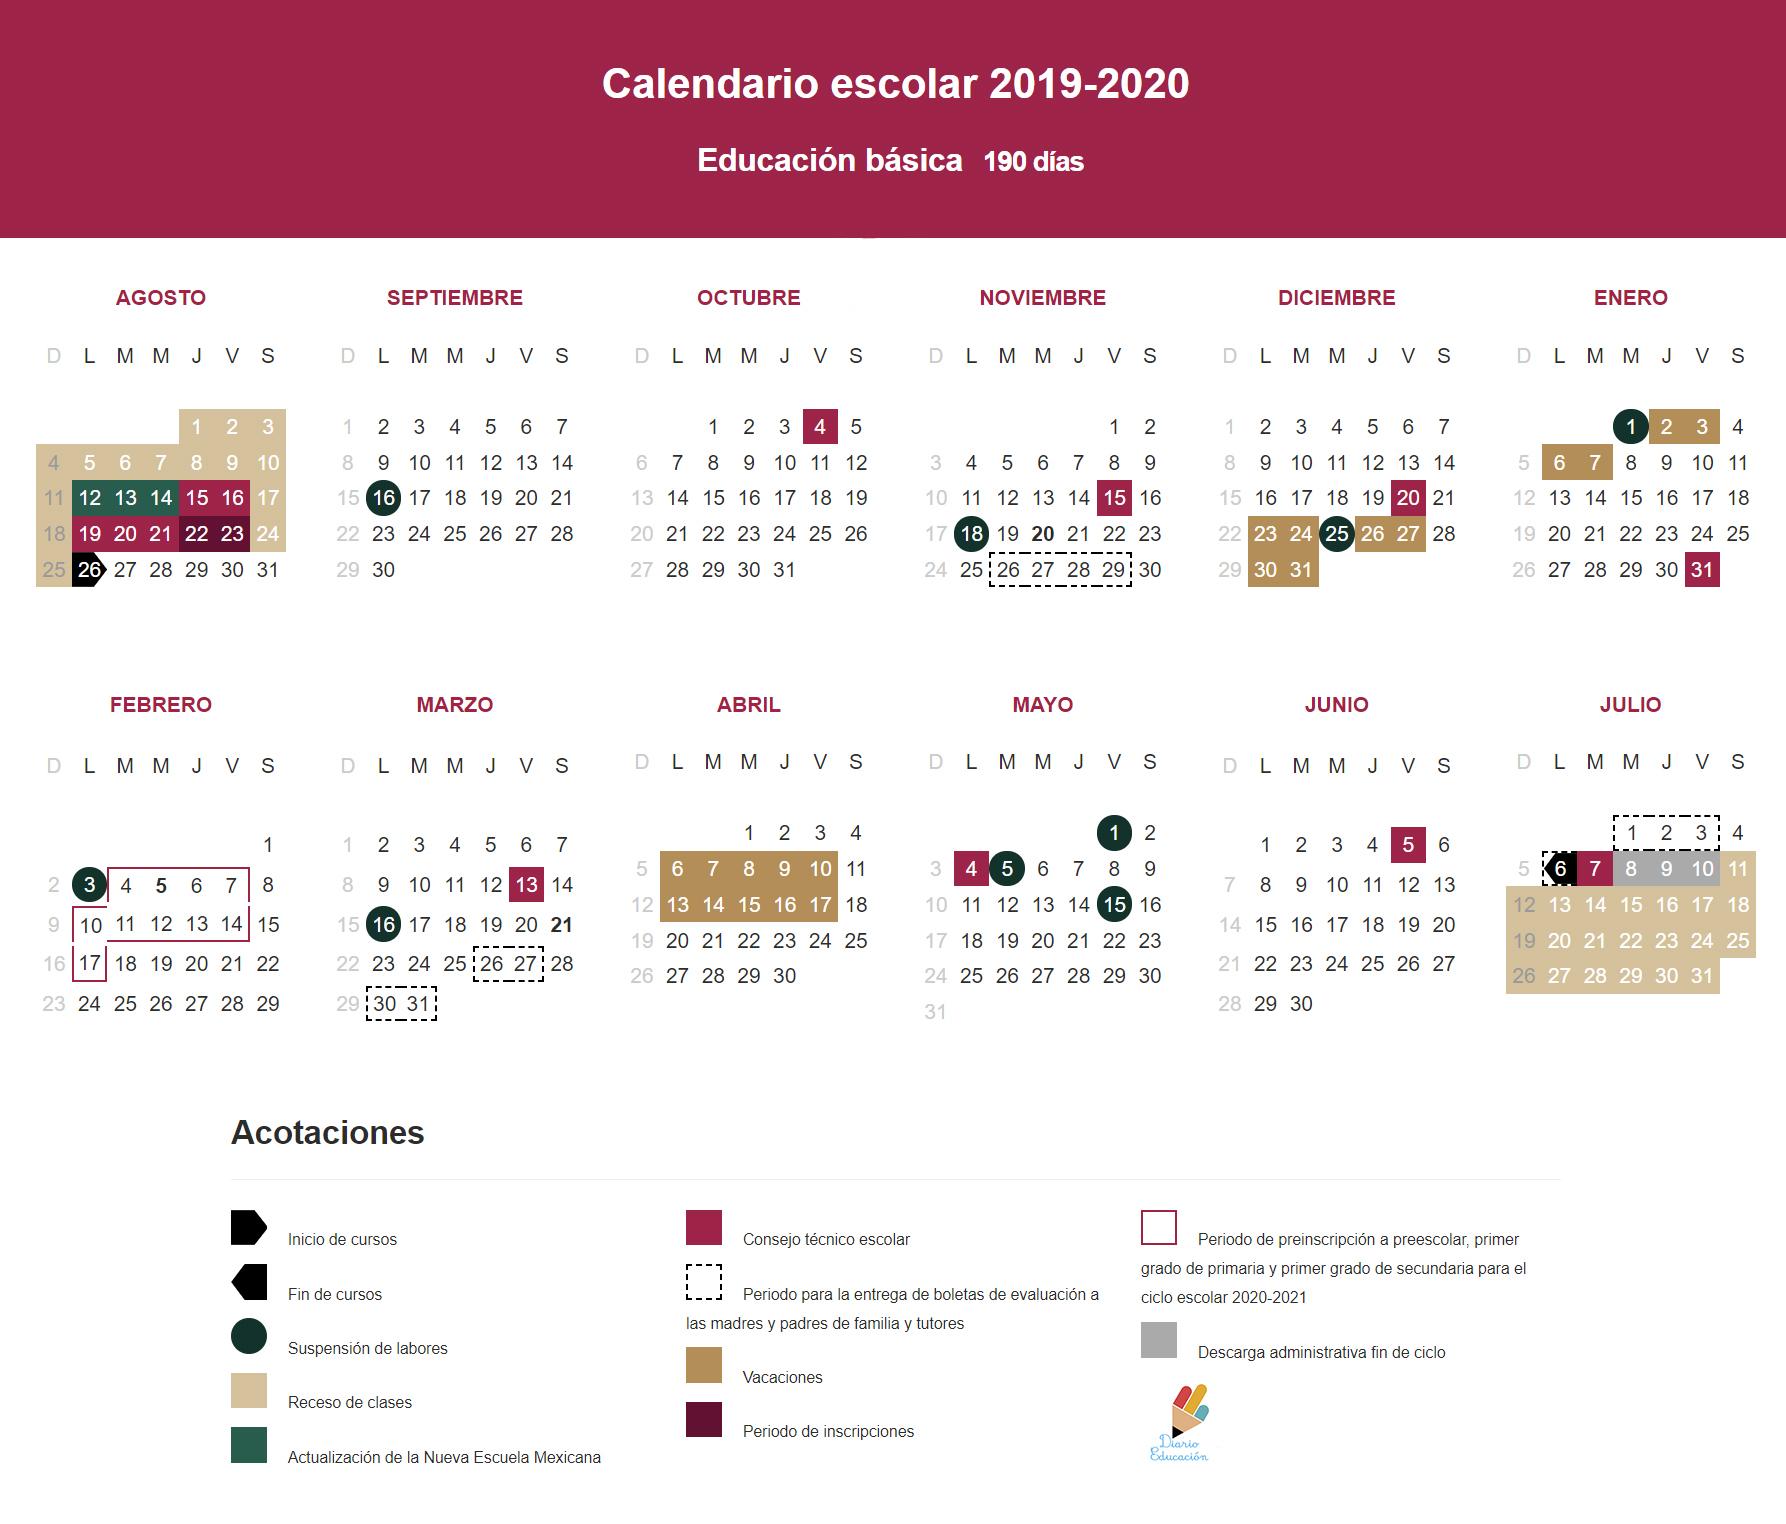 Calendario Junio 2020 Pdf.Calendario Escolar 2019 2020 Pdf Diario Educacion